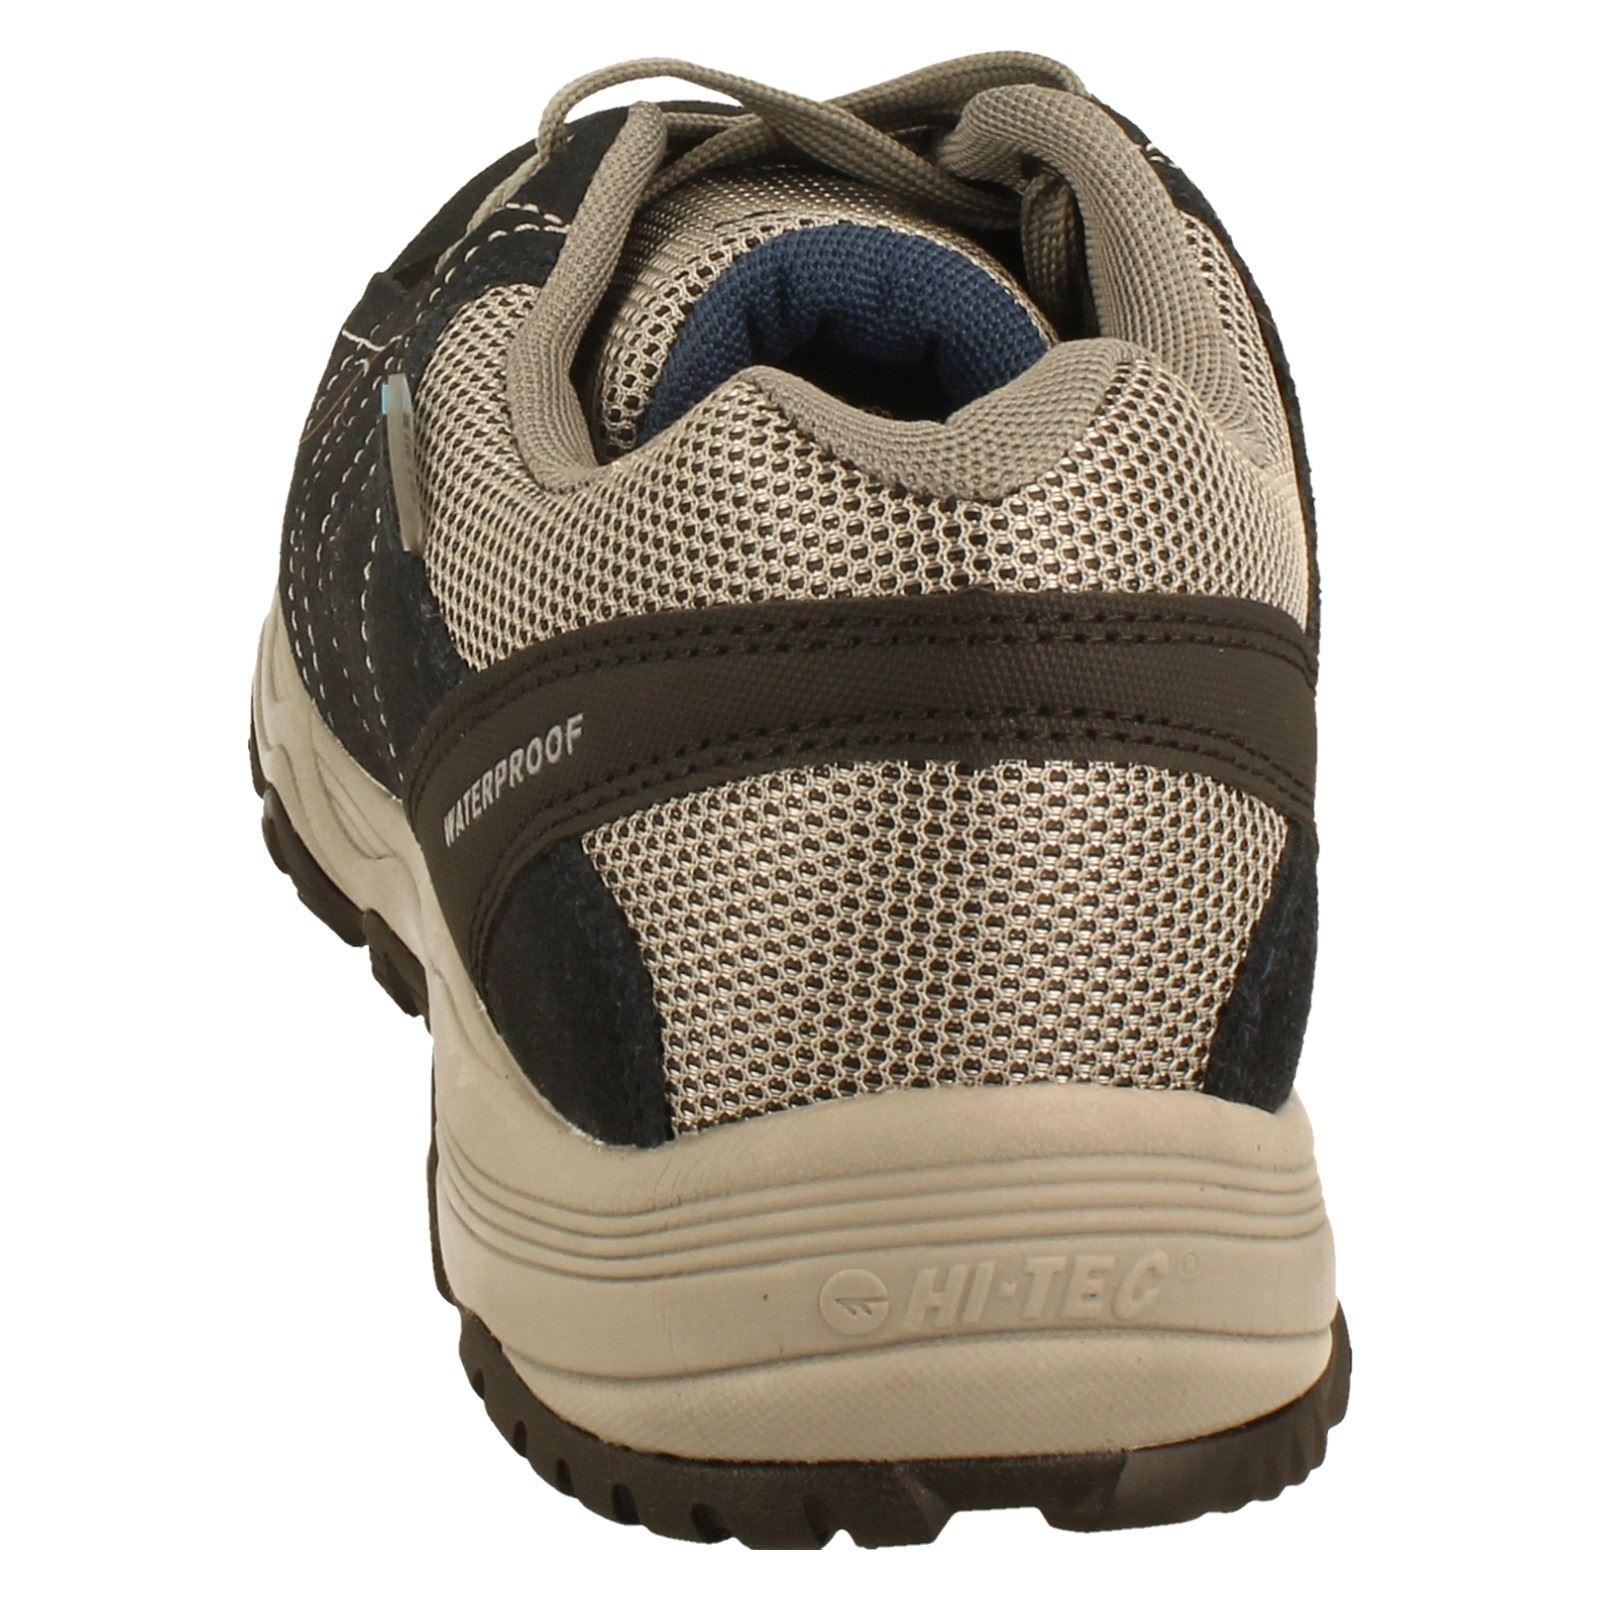 wholesale dealer beccd 01406 ... Nike Air Zoom Spiridon  16 SE Men s Trainers Size Size Size AJ2030 001  f72e41 ...